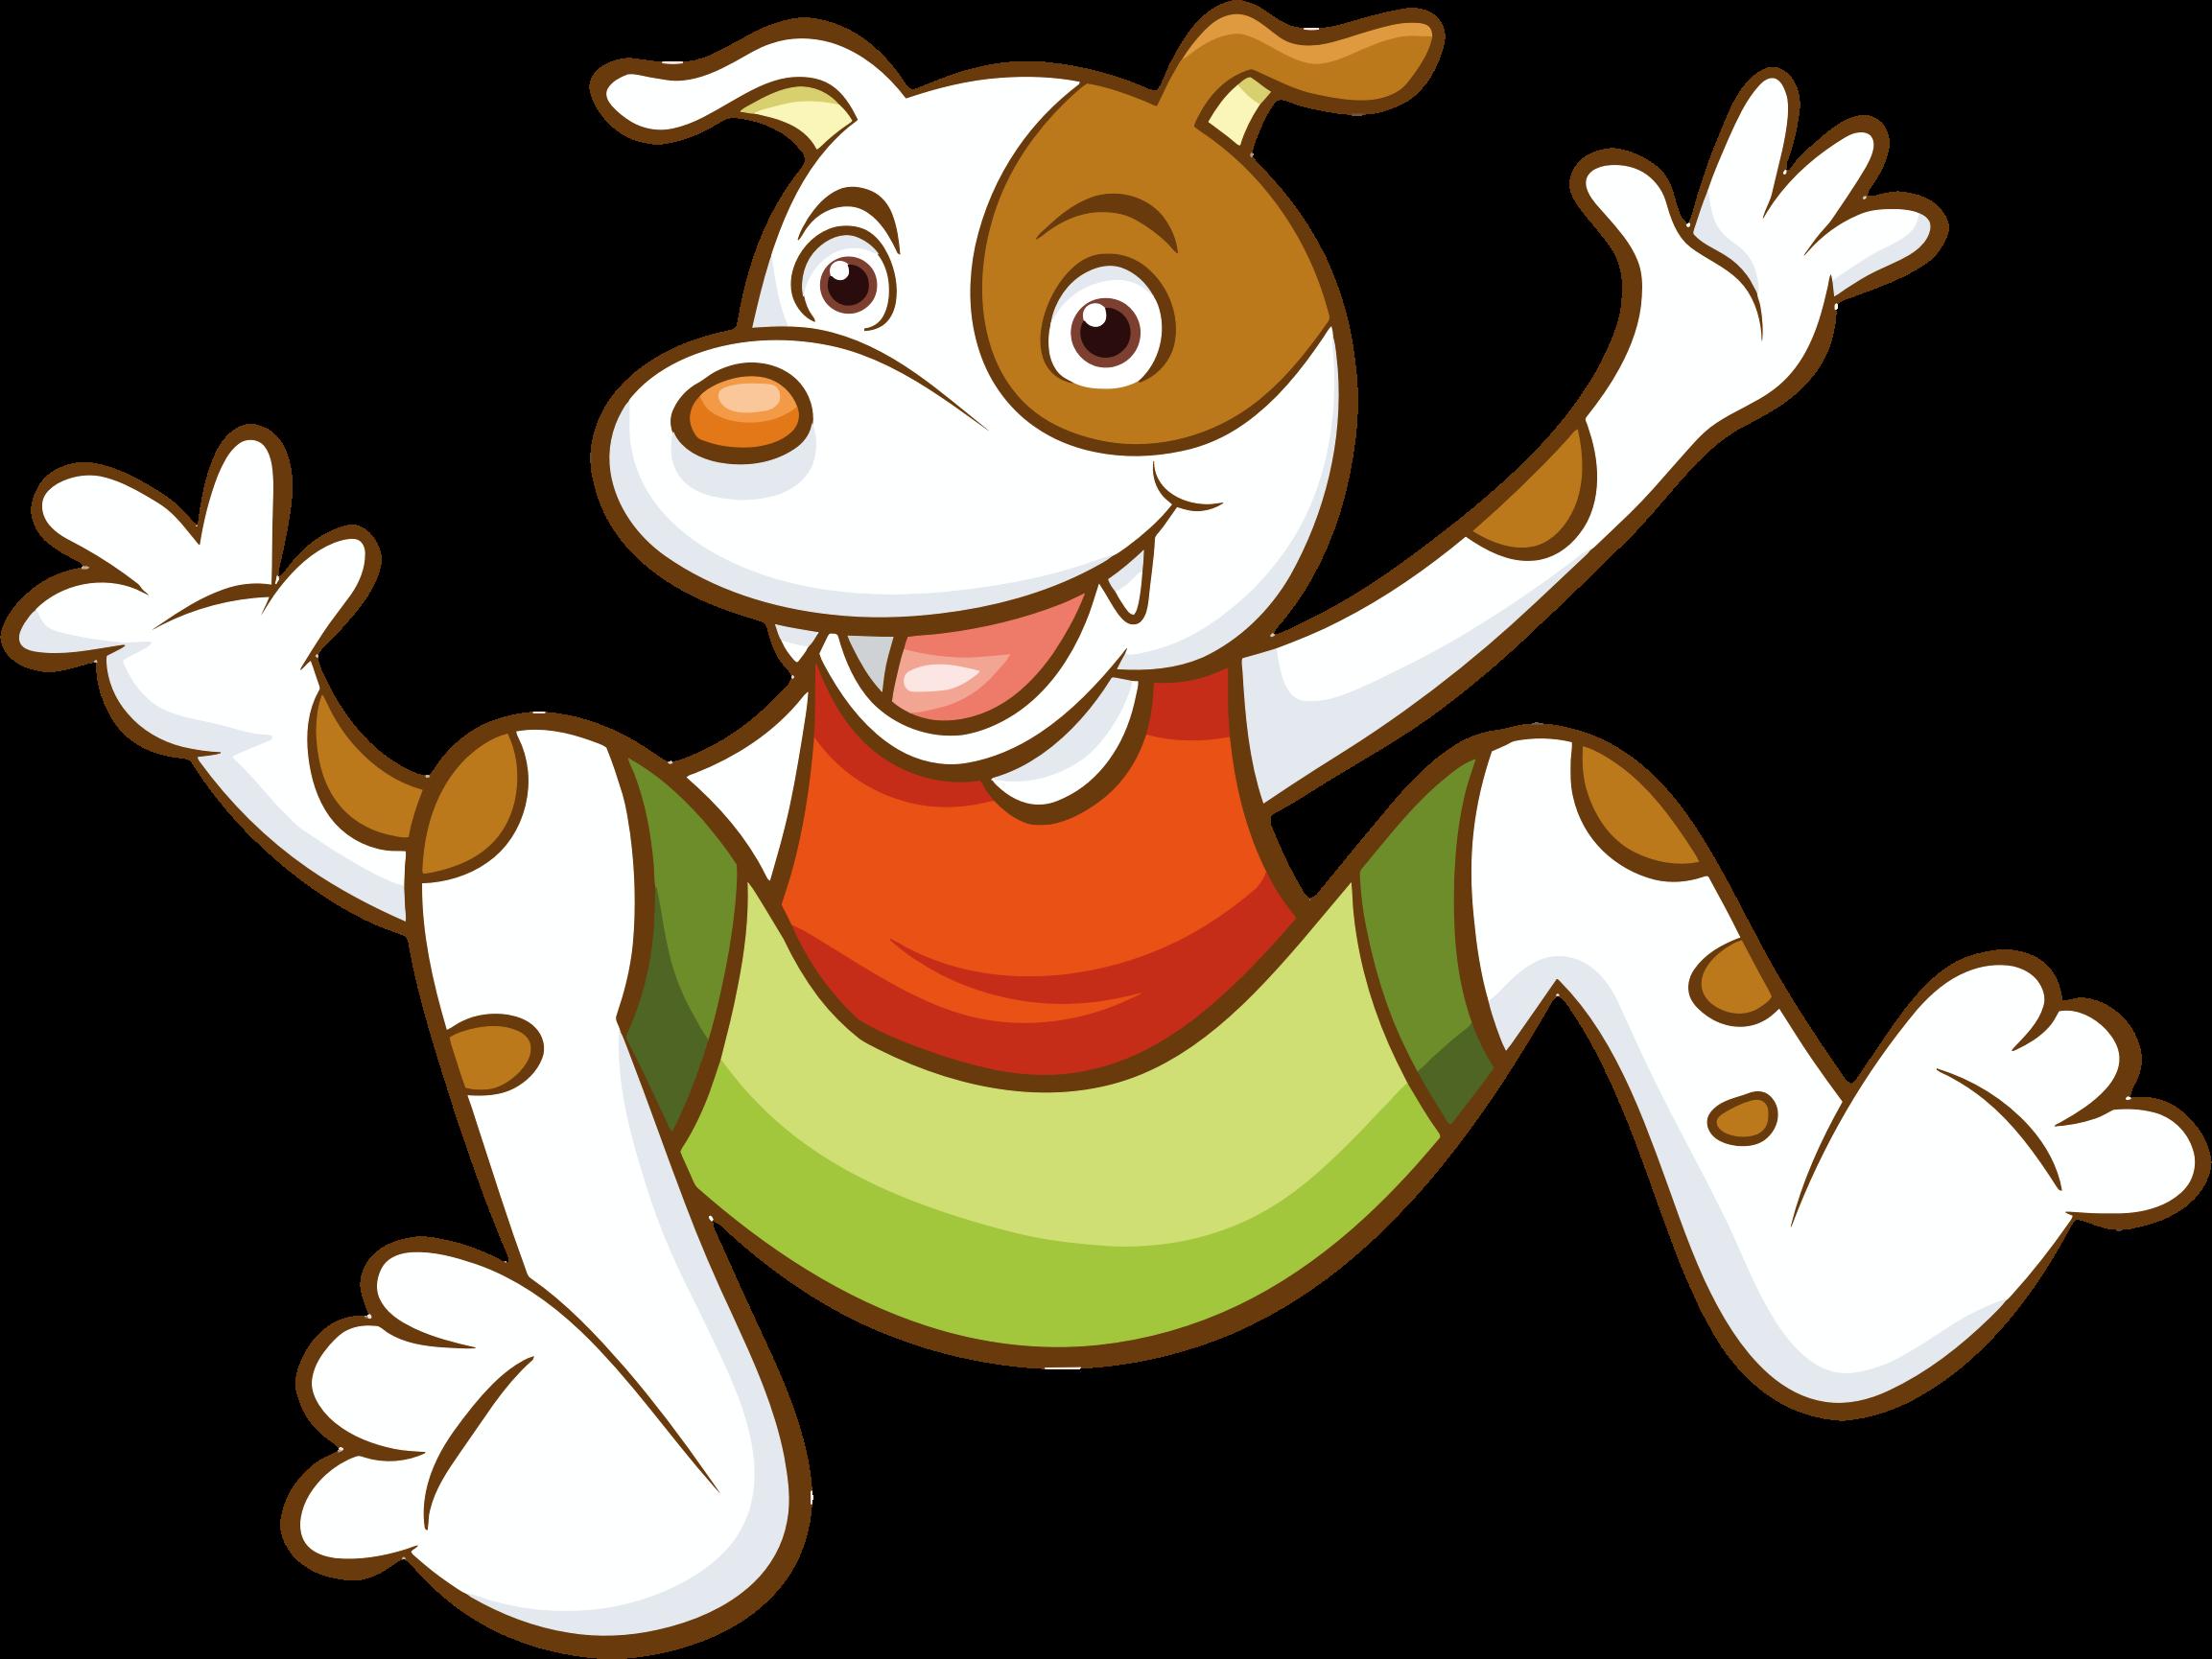 Cartoon Dog Vector File image - Free stock photo - Public ...